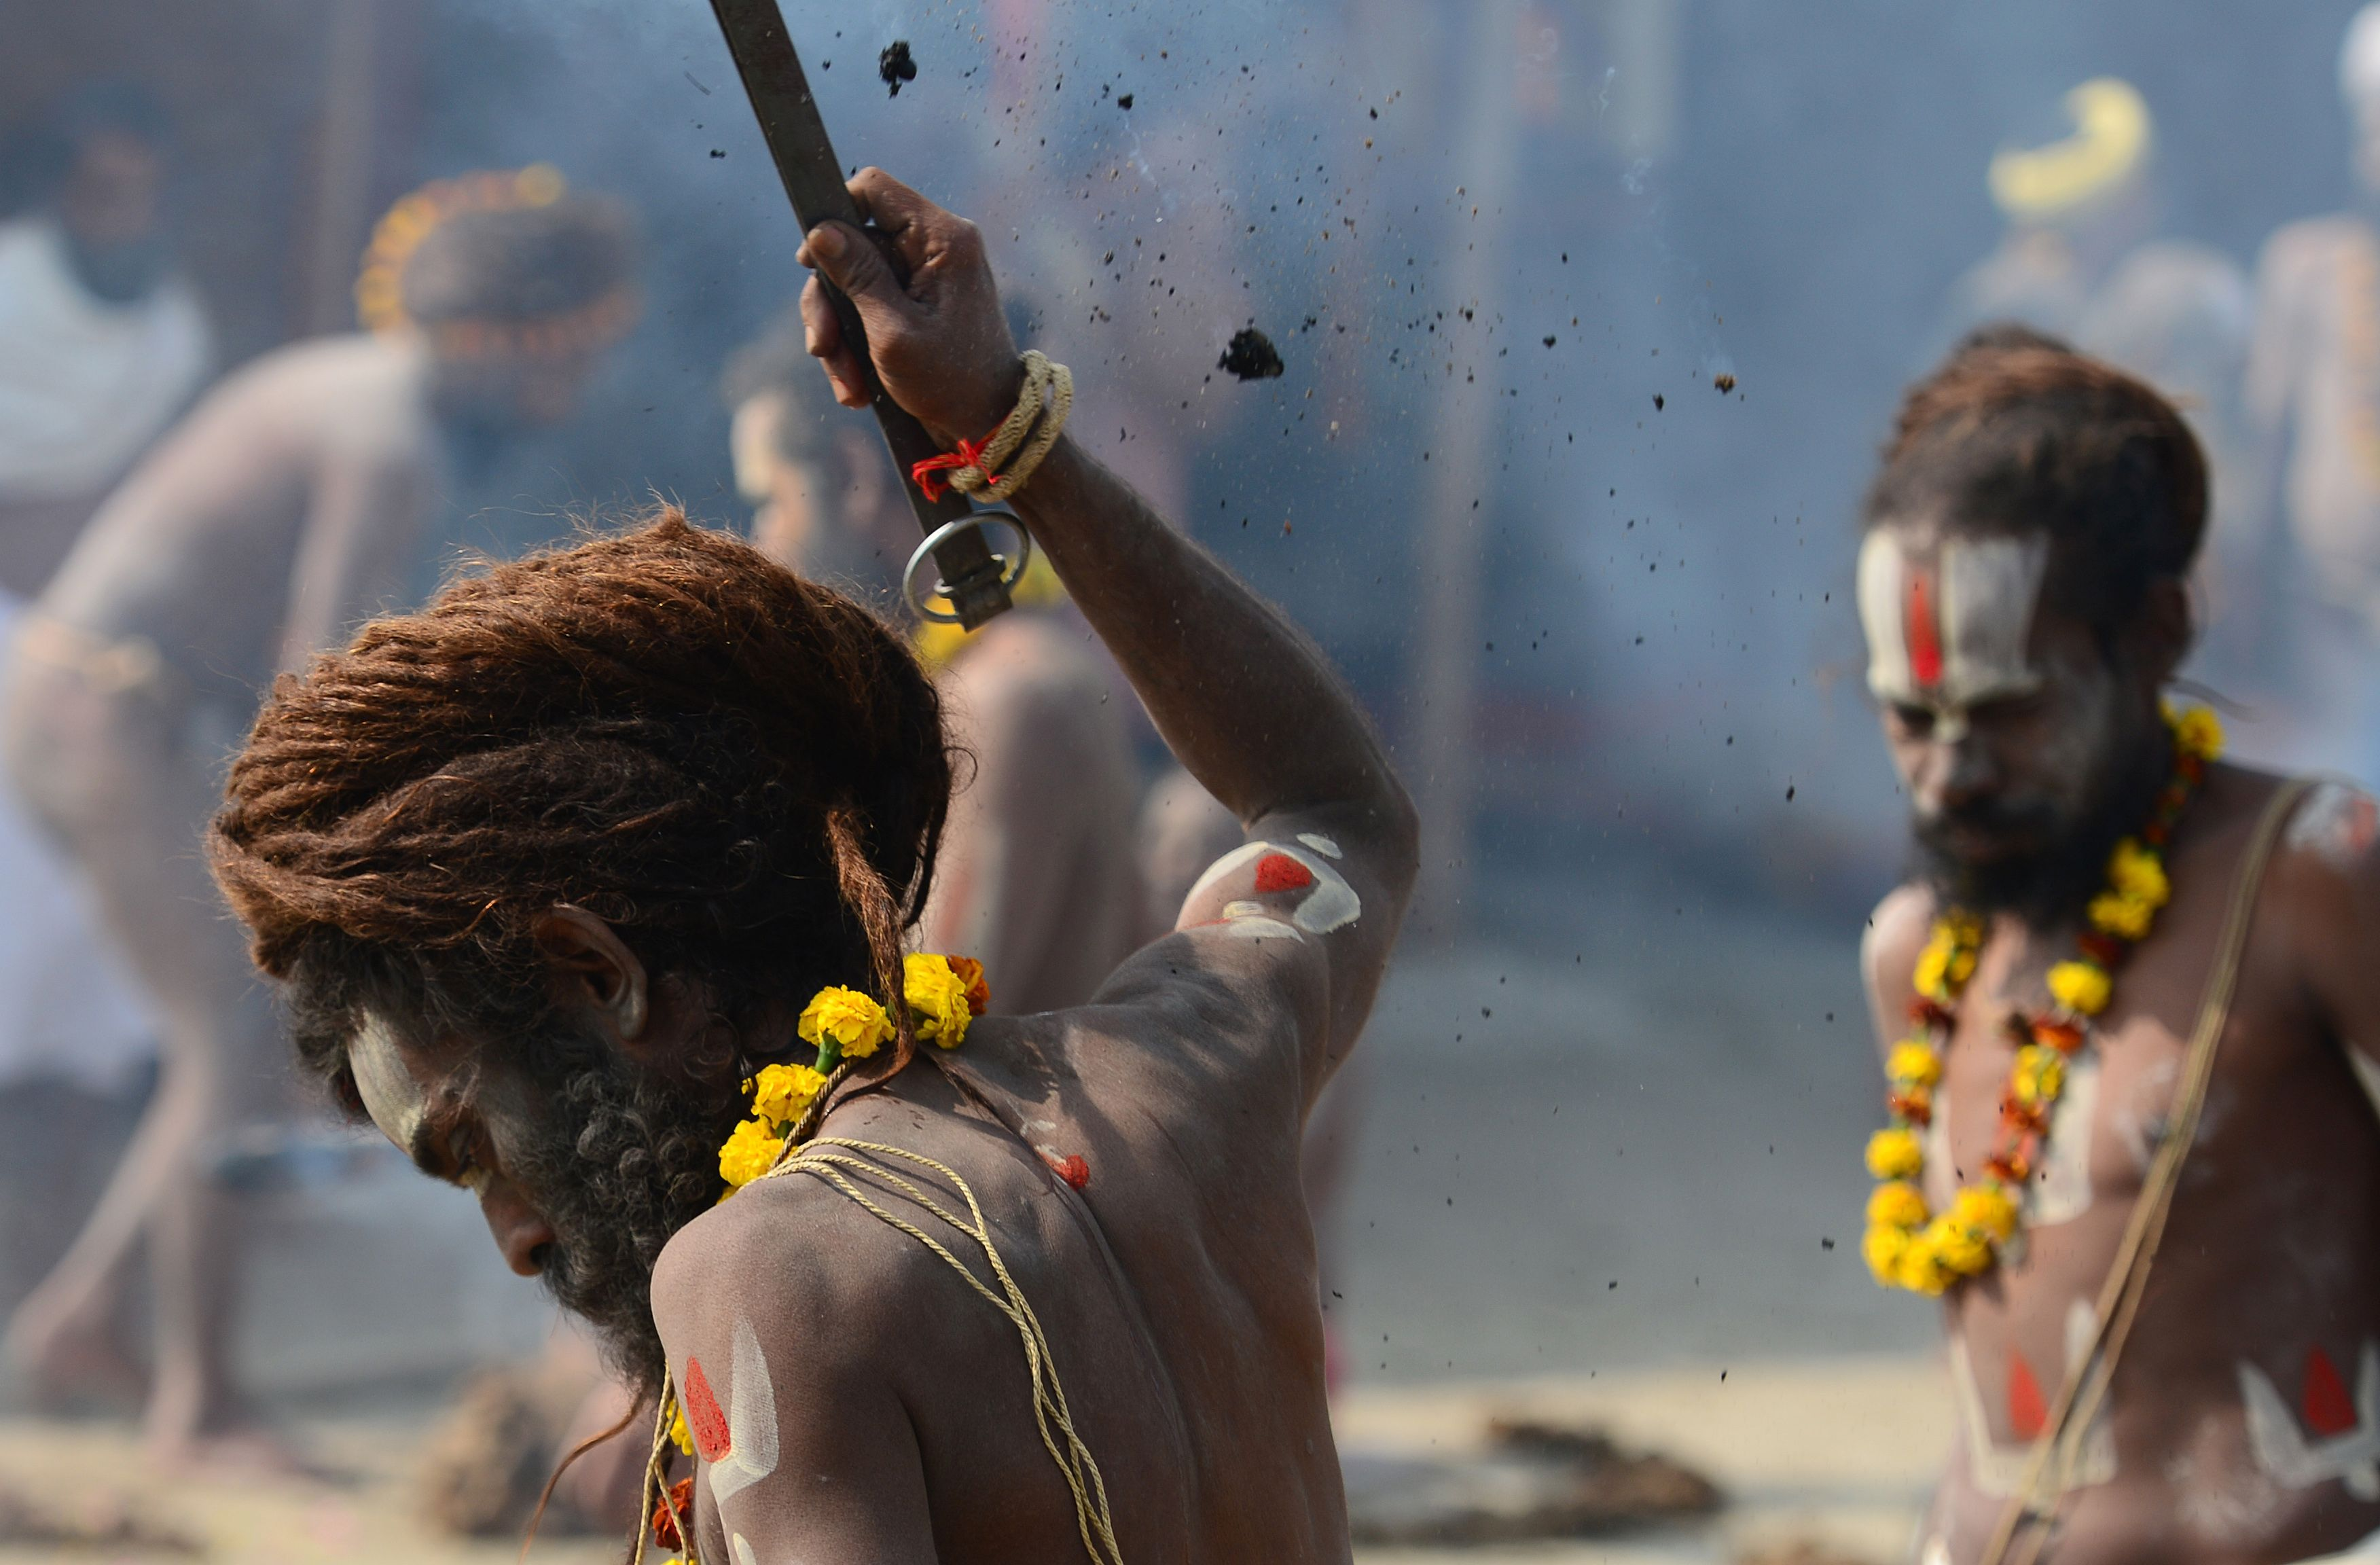 طقوس هندوسية فى مهرجان ماغ ميلا